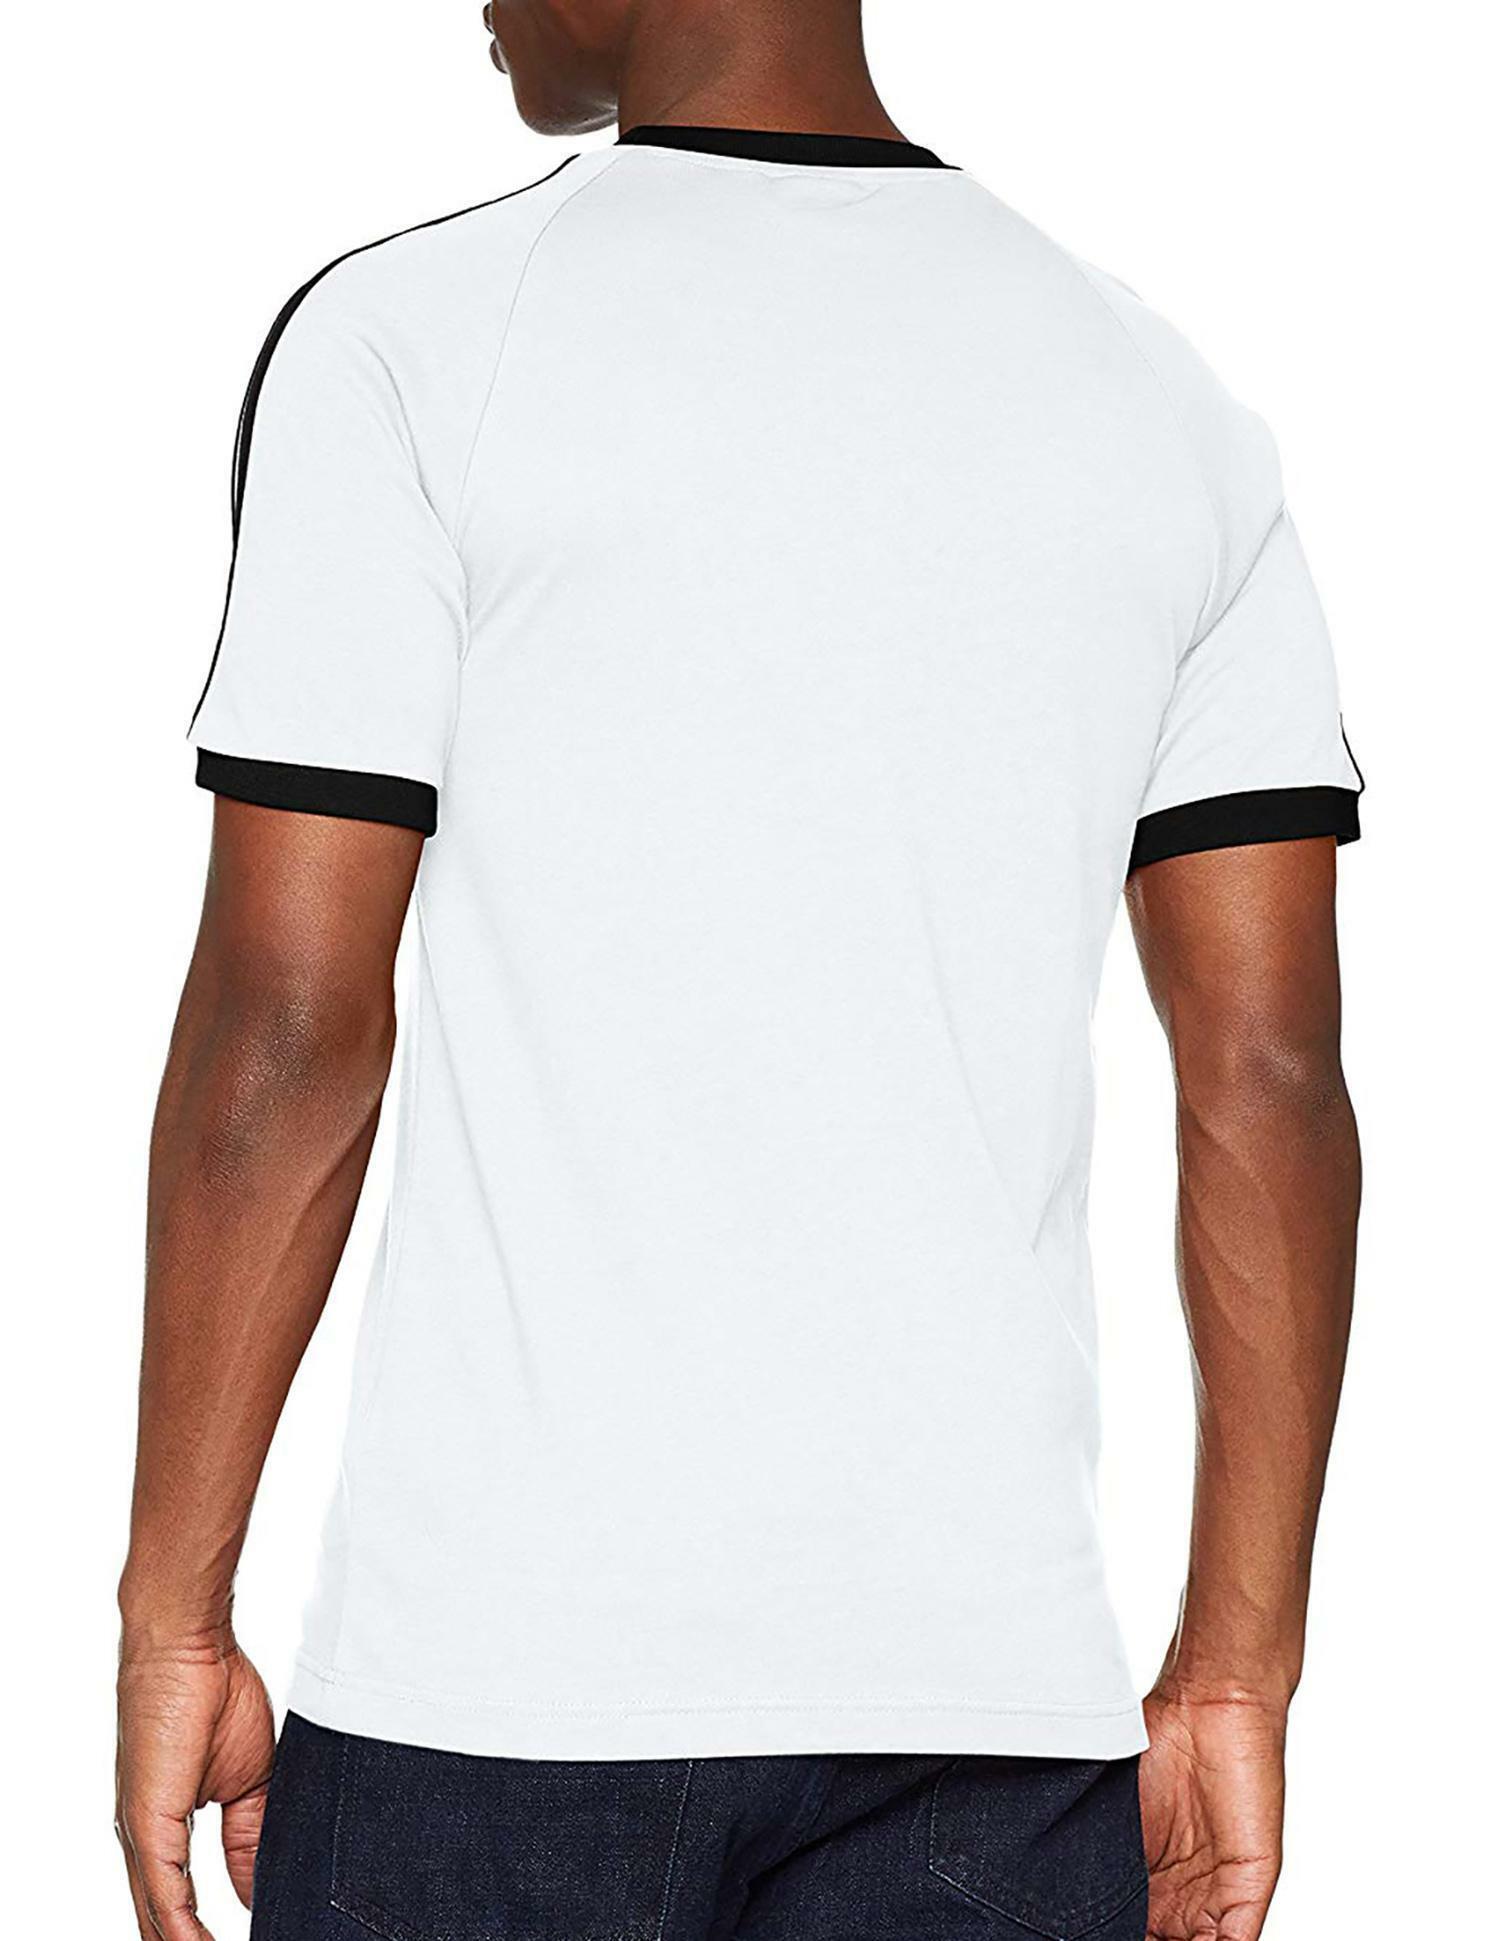 adidas adidas 3-stripes tee t-shirt uomo bianca cw1203